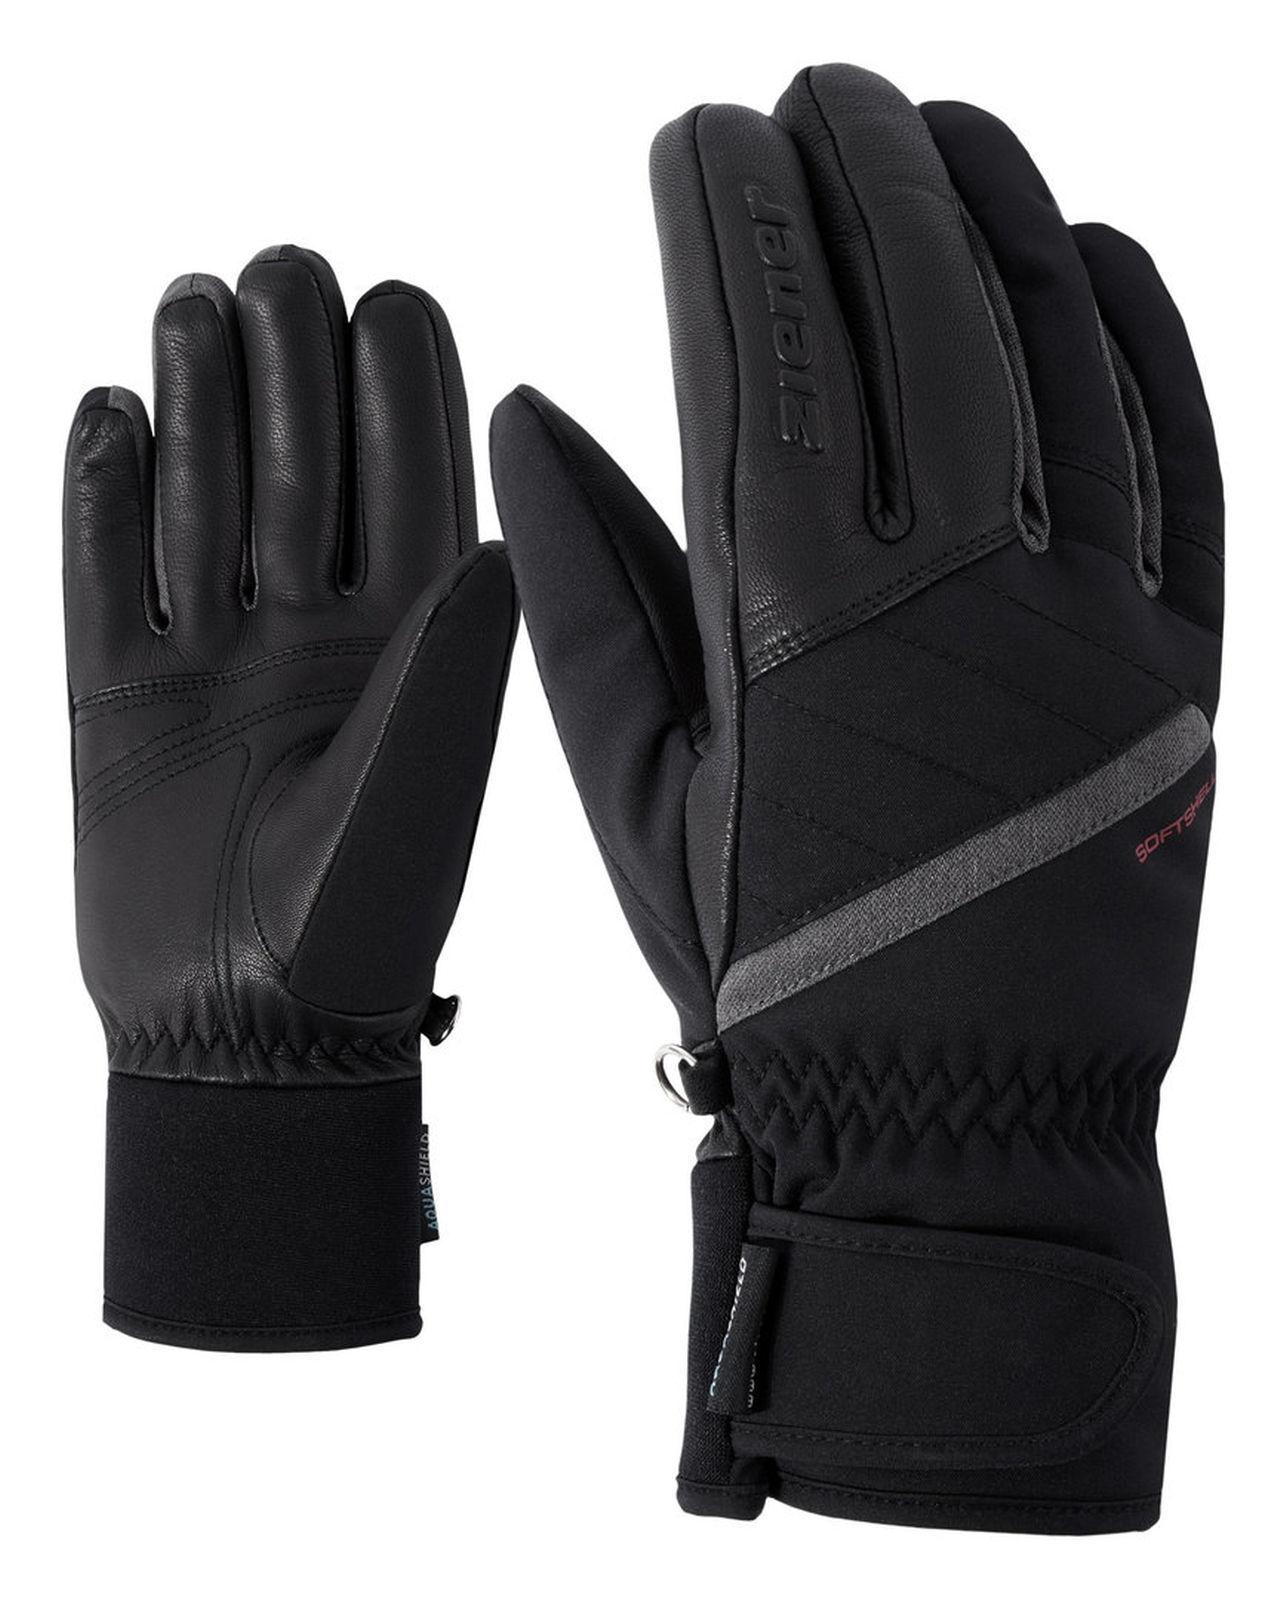 Ziener Damen Skihandschuhe KASADA AS® AS® KASADA lady glove  schwarz grau 181103 12858 1da93a